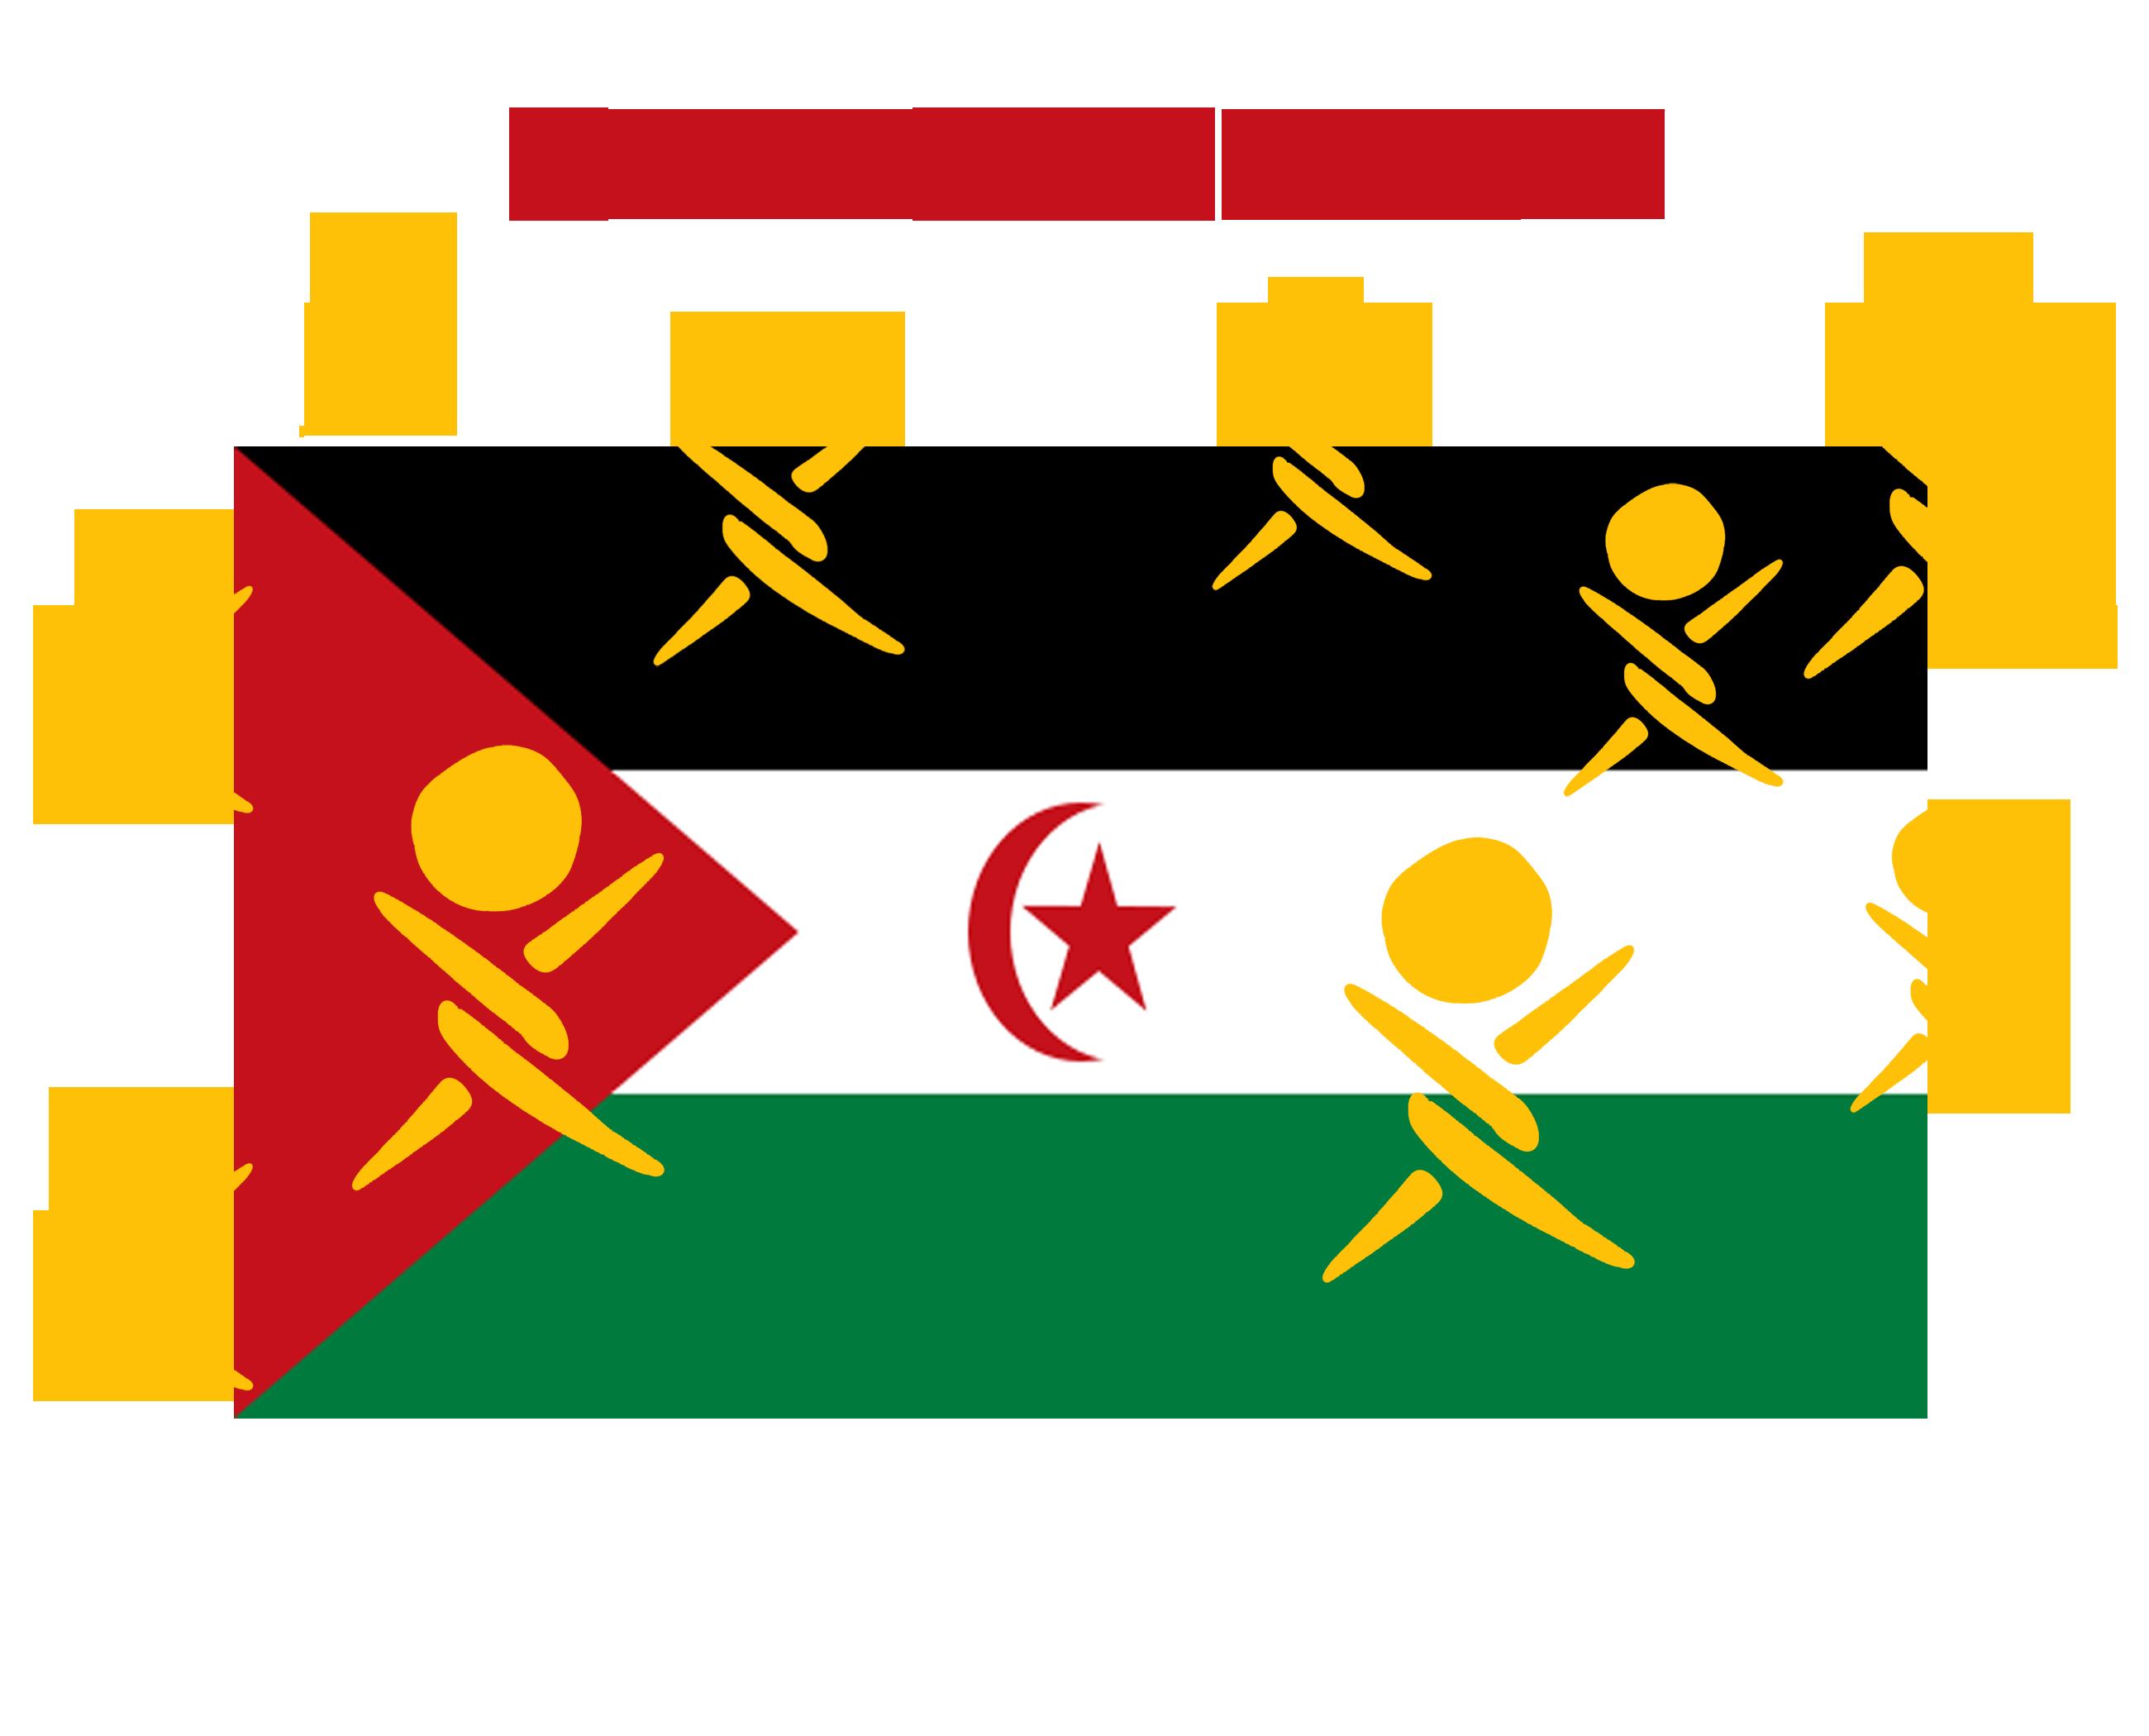 soutien au peuple sahraoui